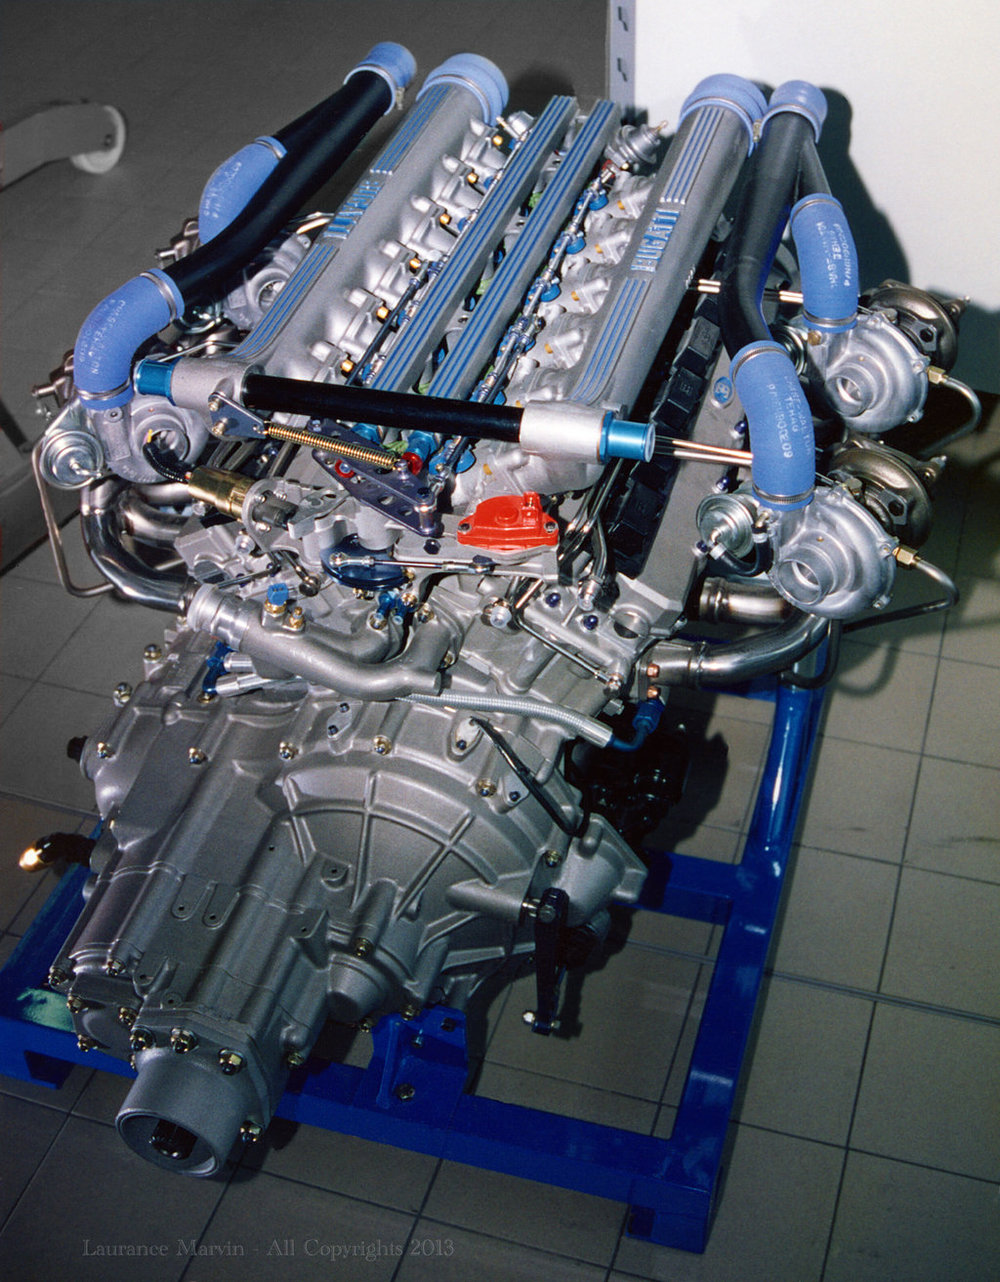 The amazing 3.5L Bugatti V12 fed by four turbochargers